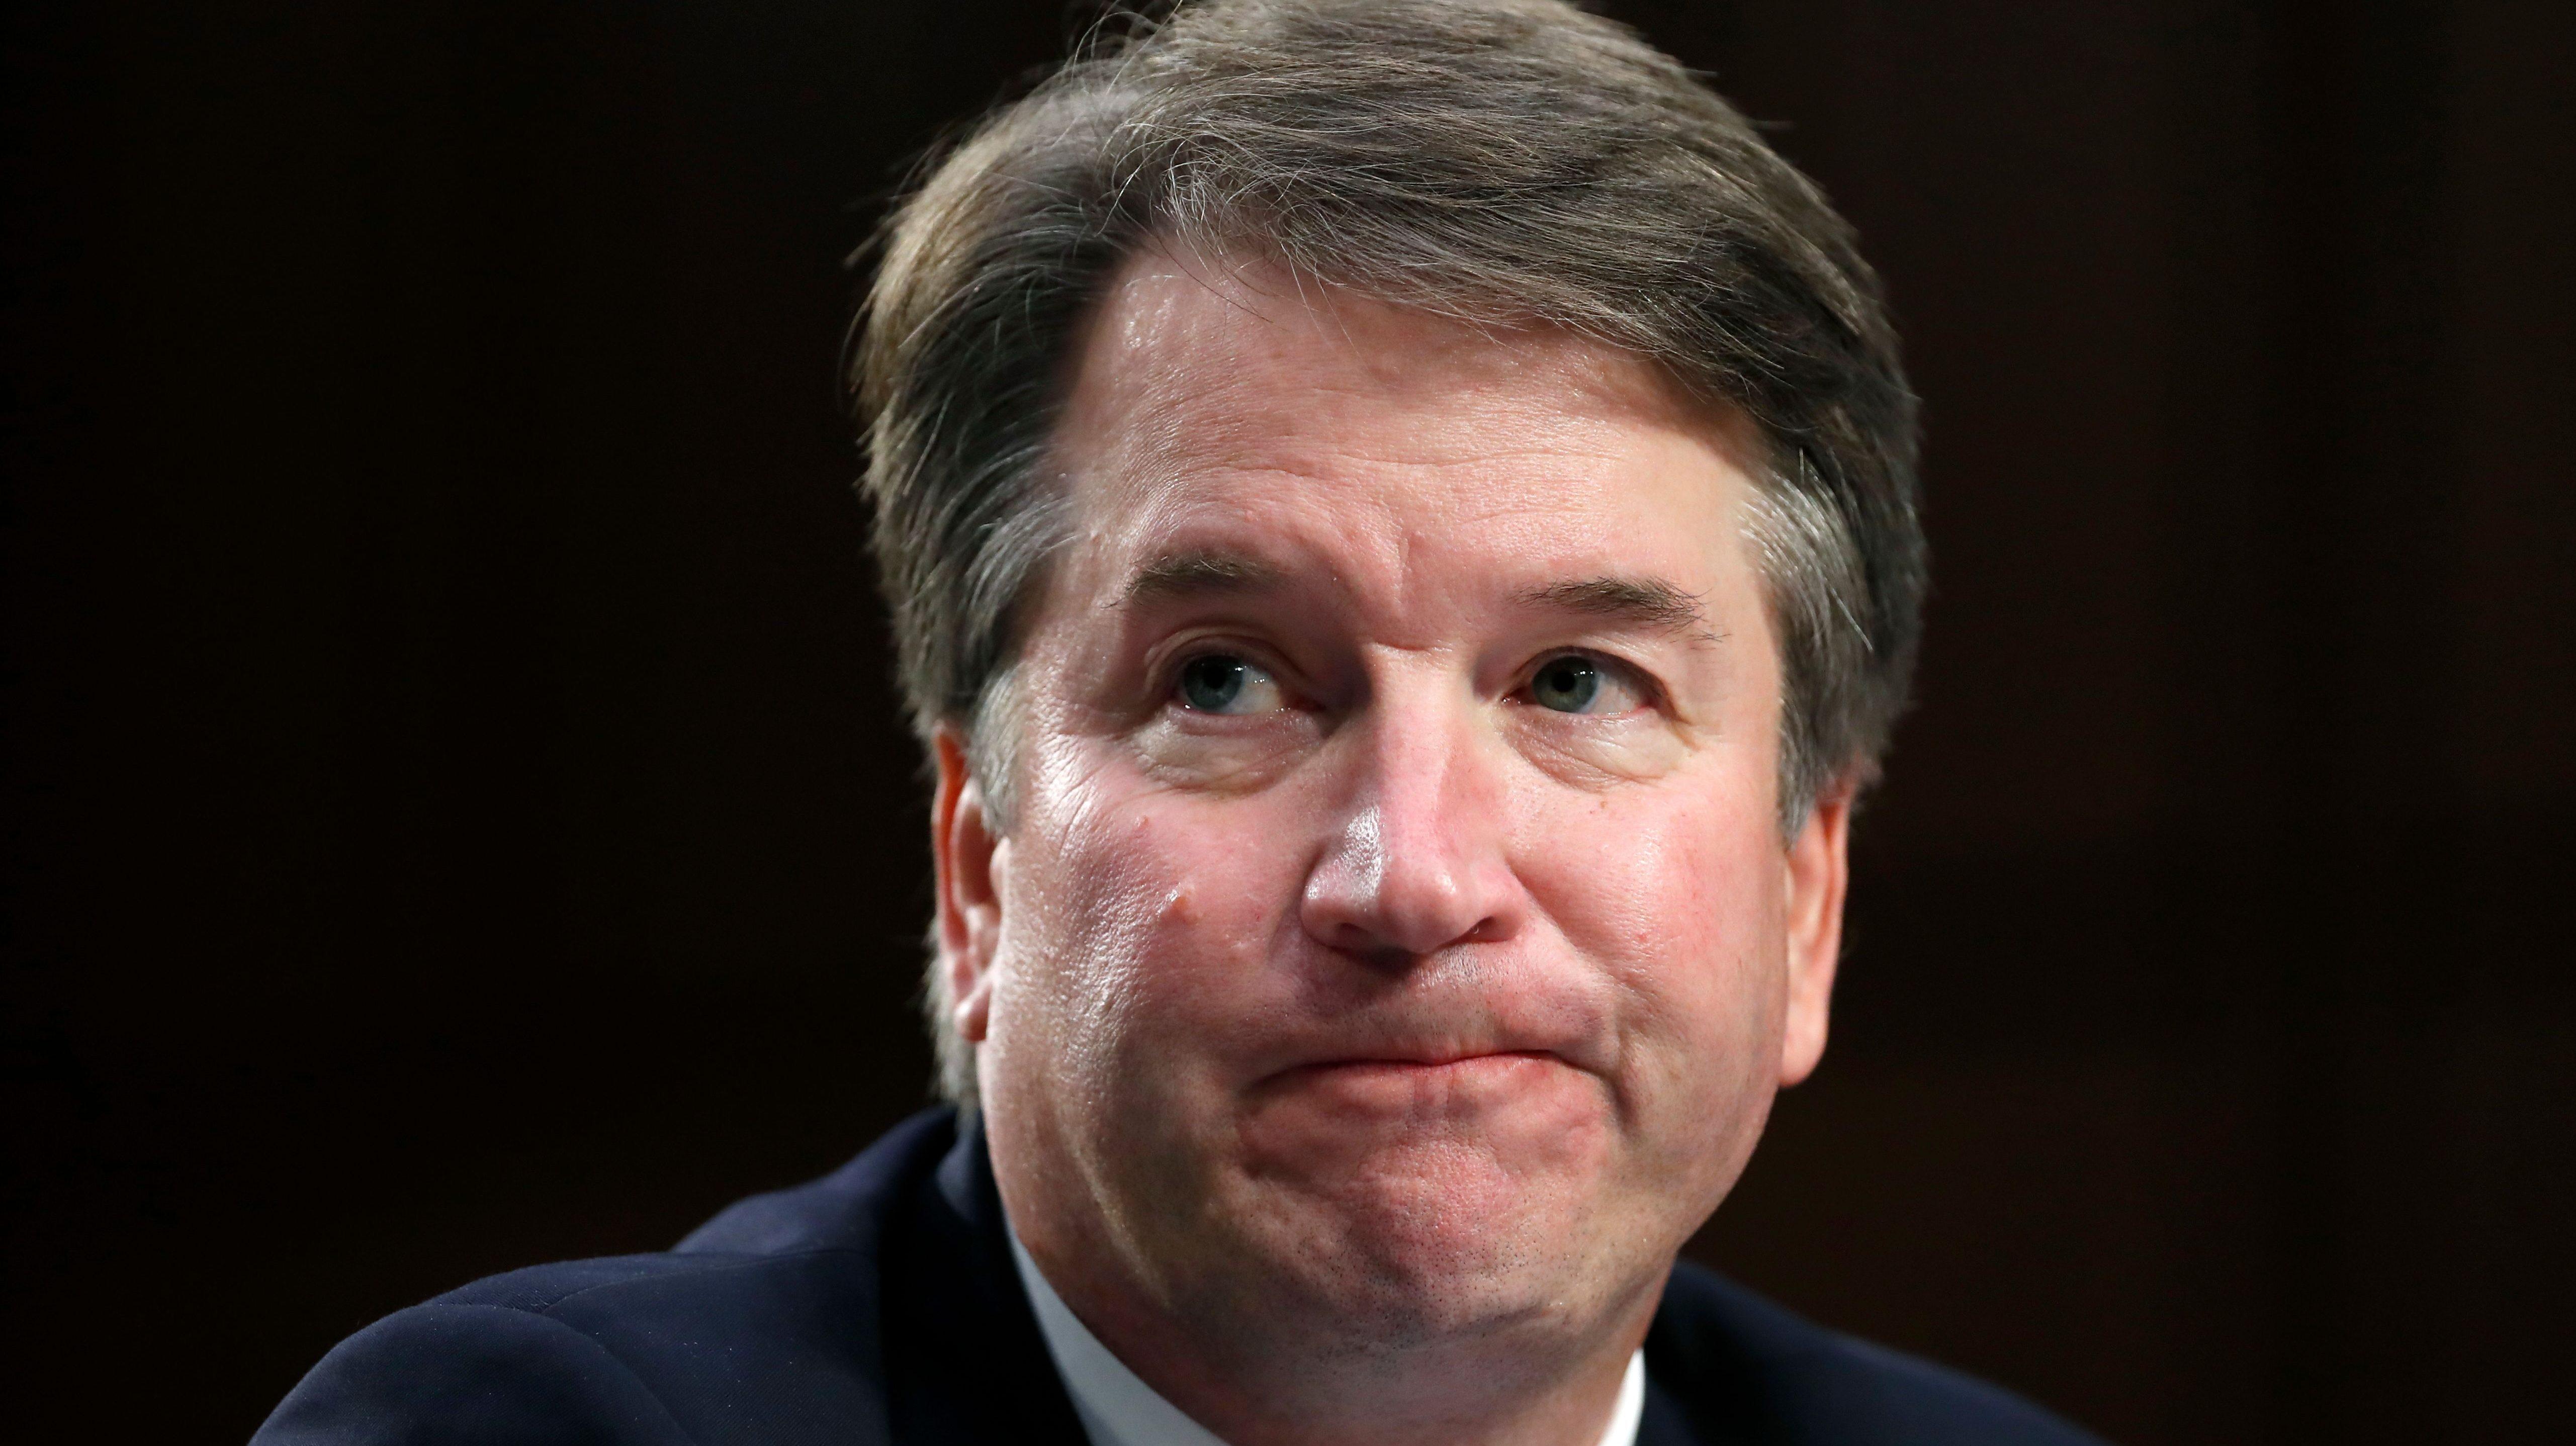 President Donald Trump's Supreme Court nominee, Brett Kavanaugh